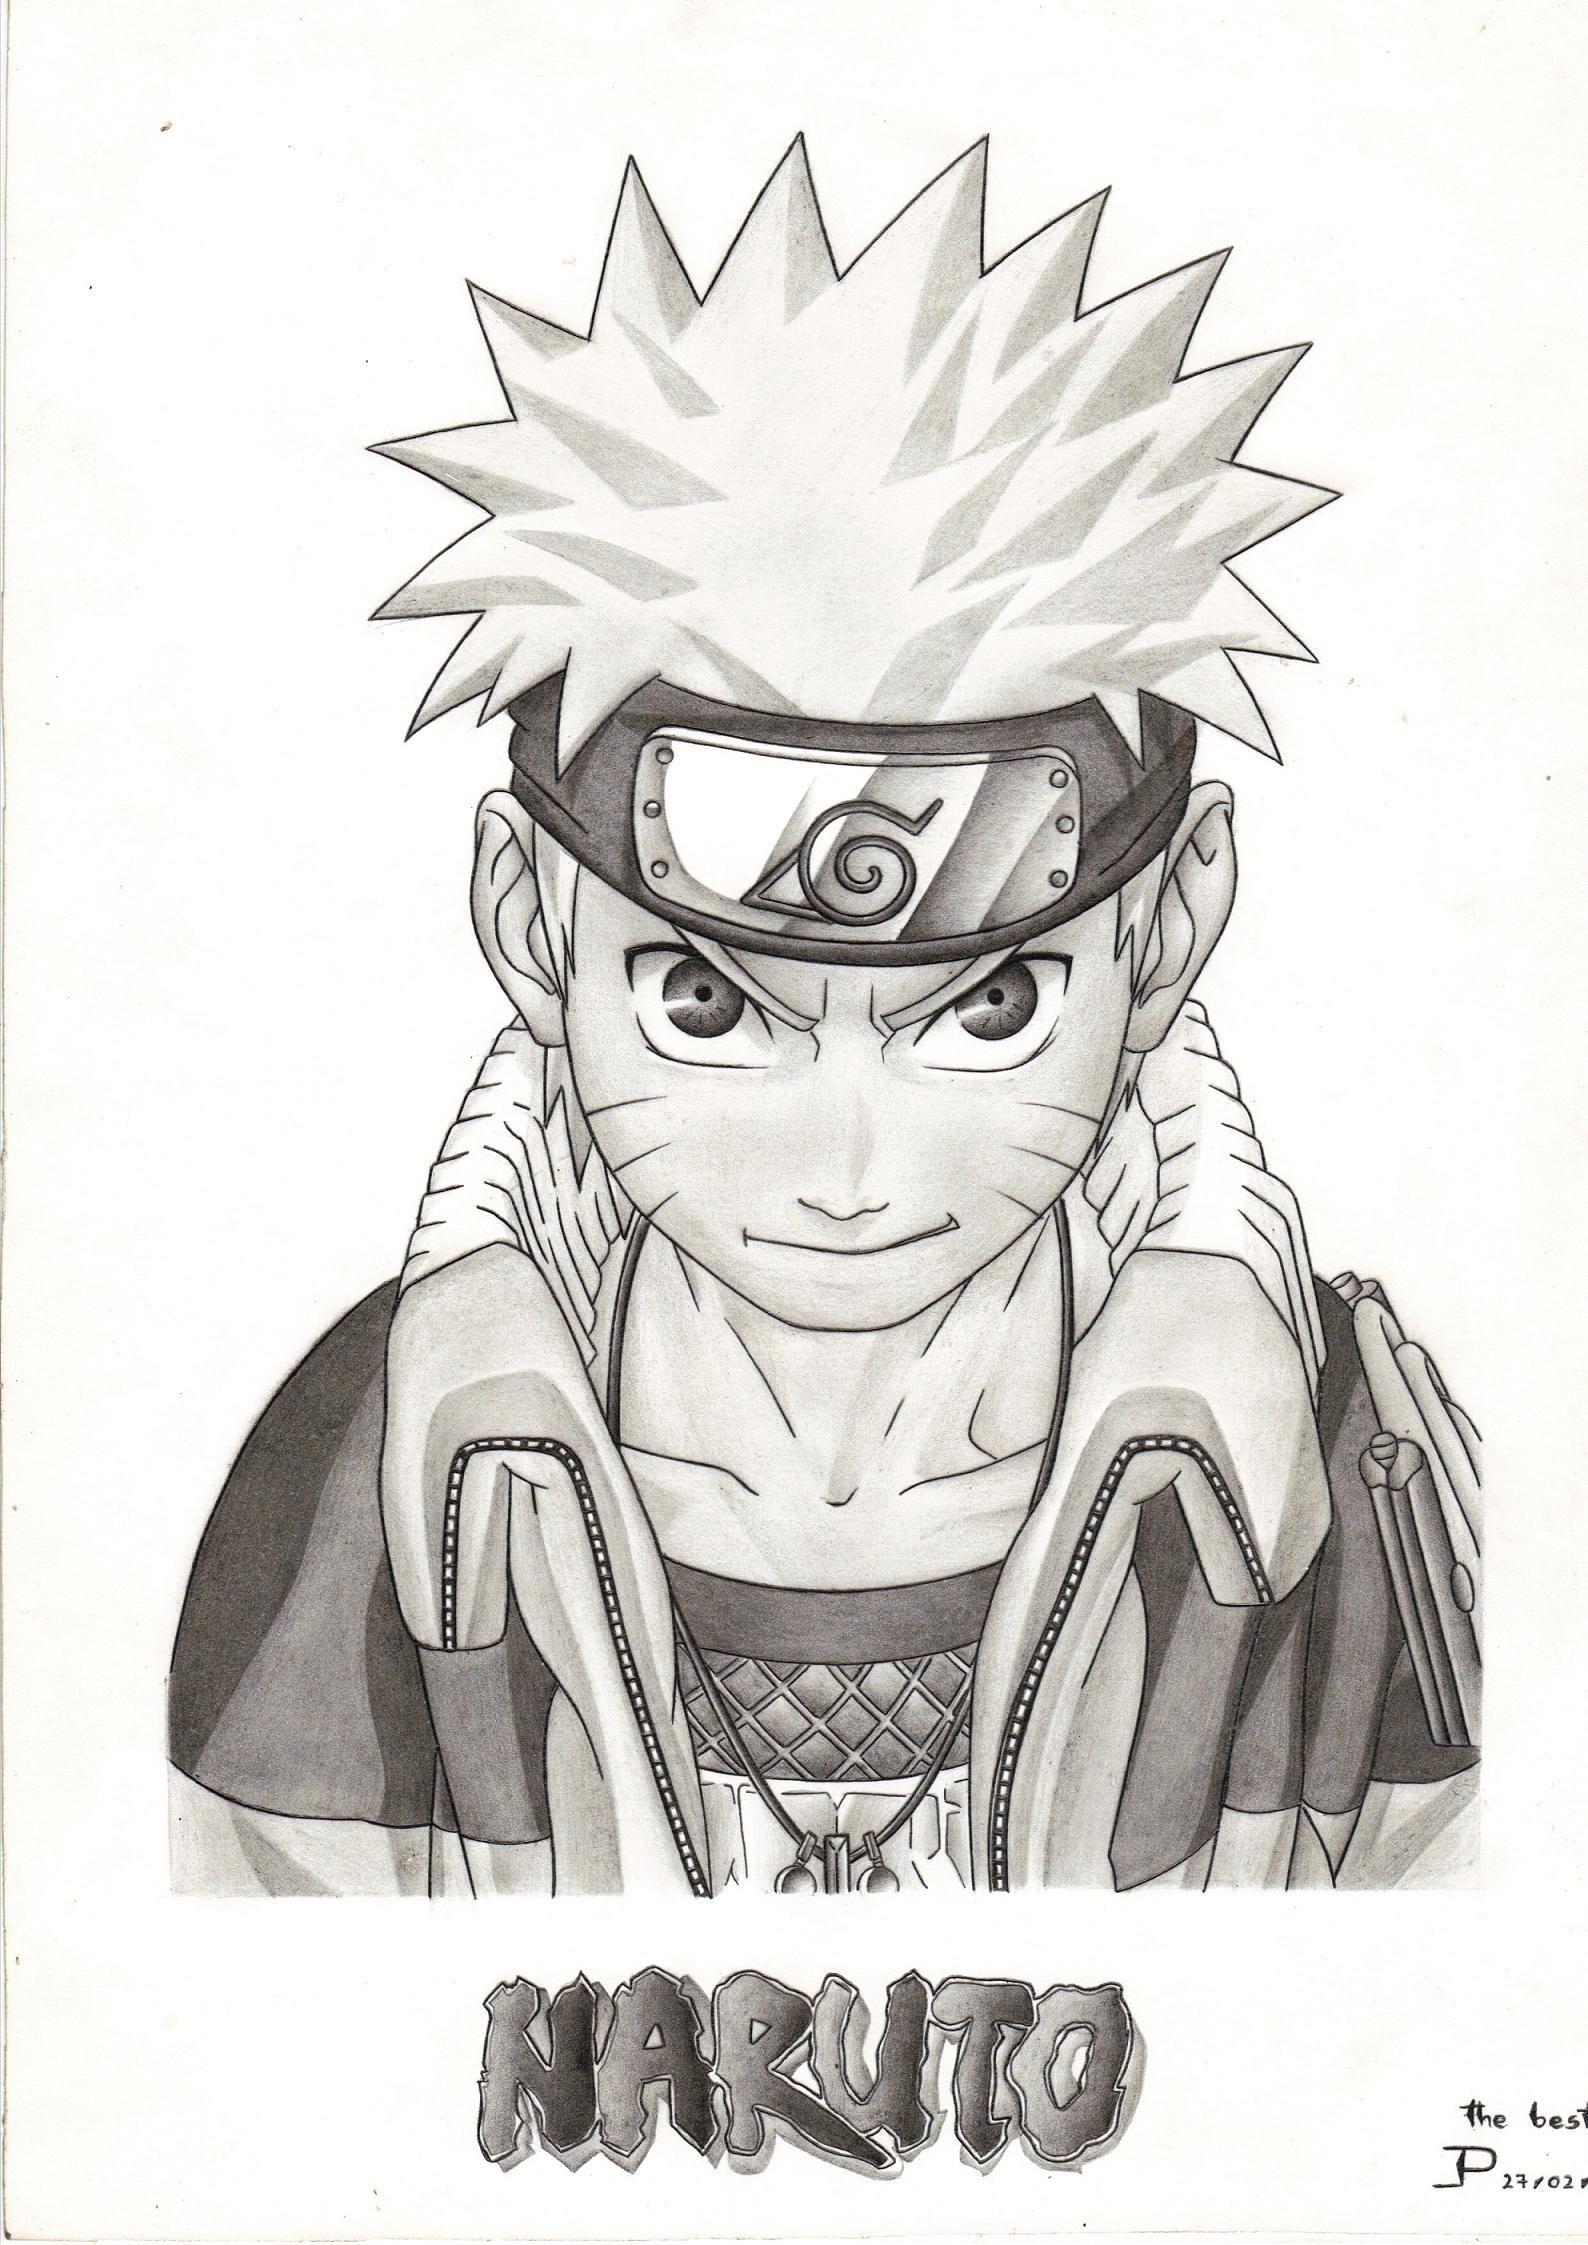 dibujos de naruto a lapiz | Dibujos de naruto, Naruto y Dibujos de